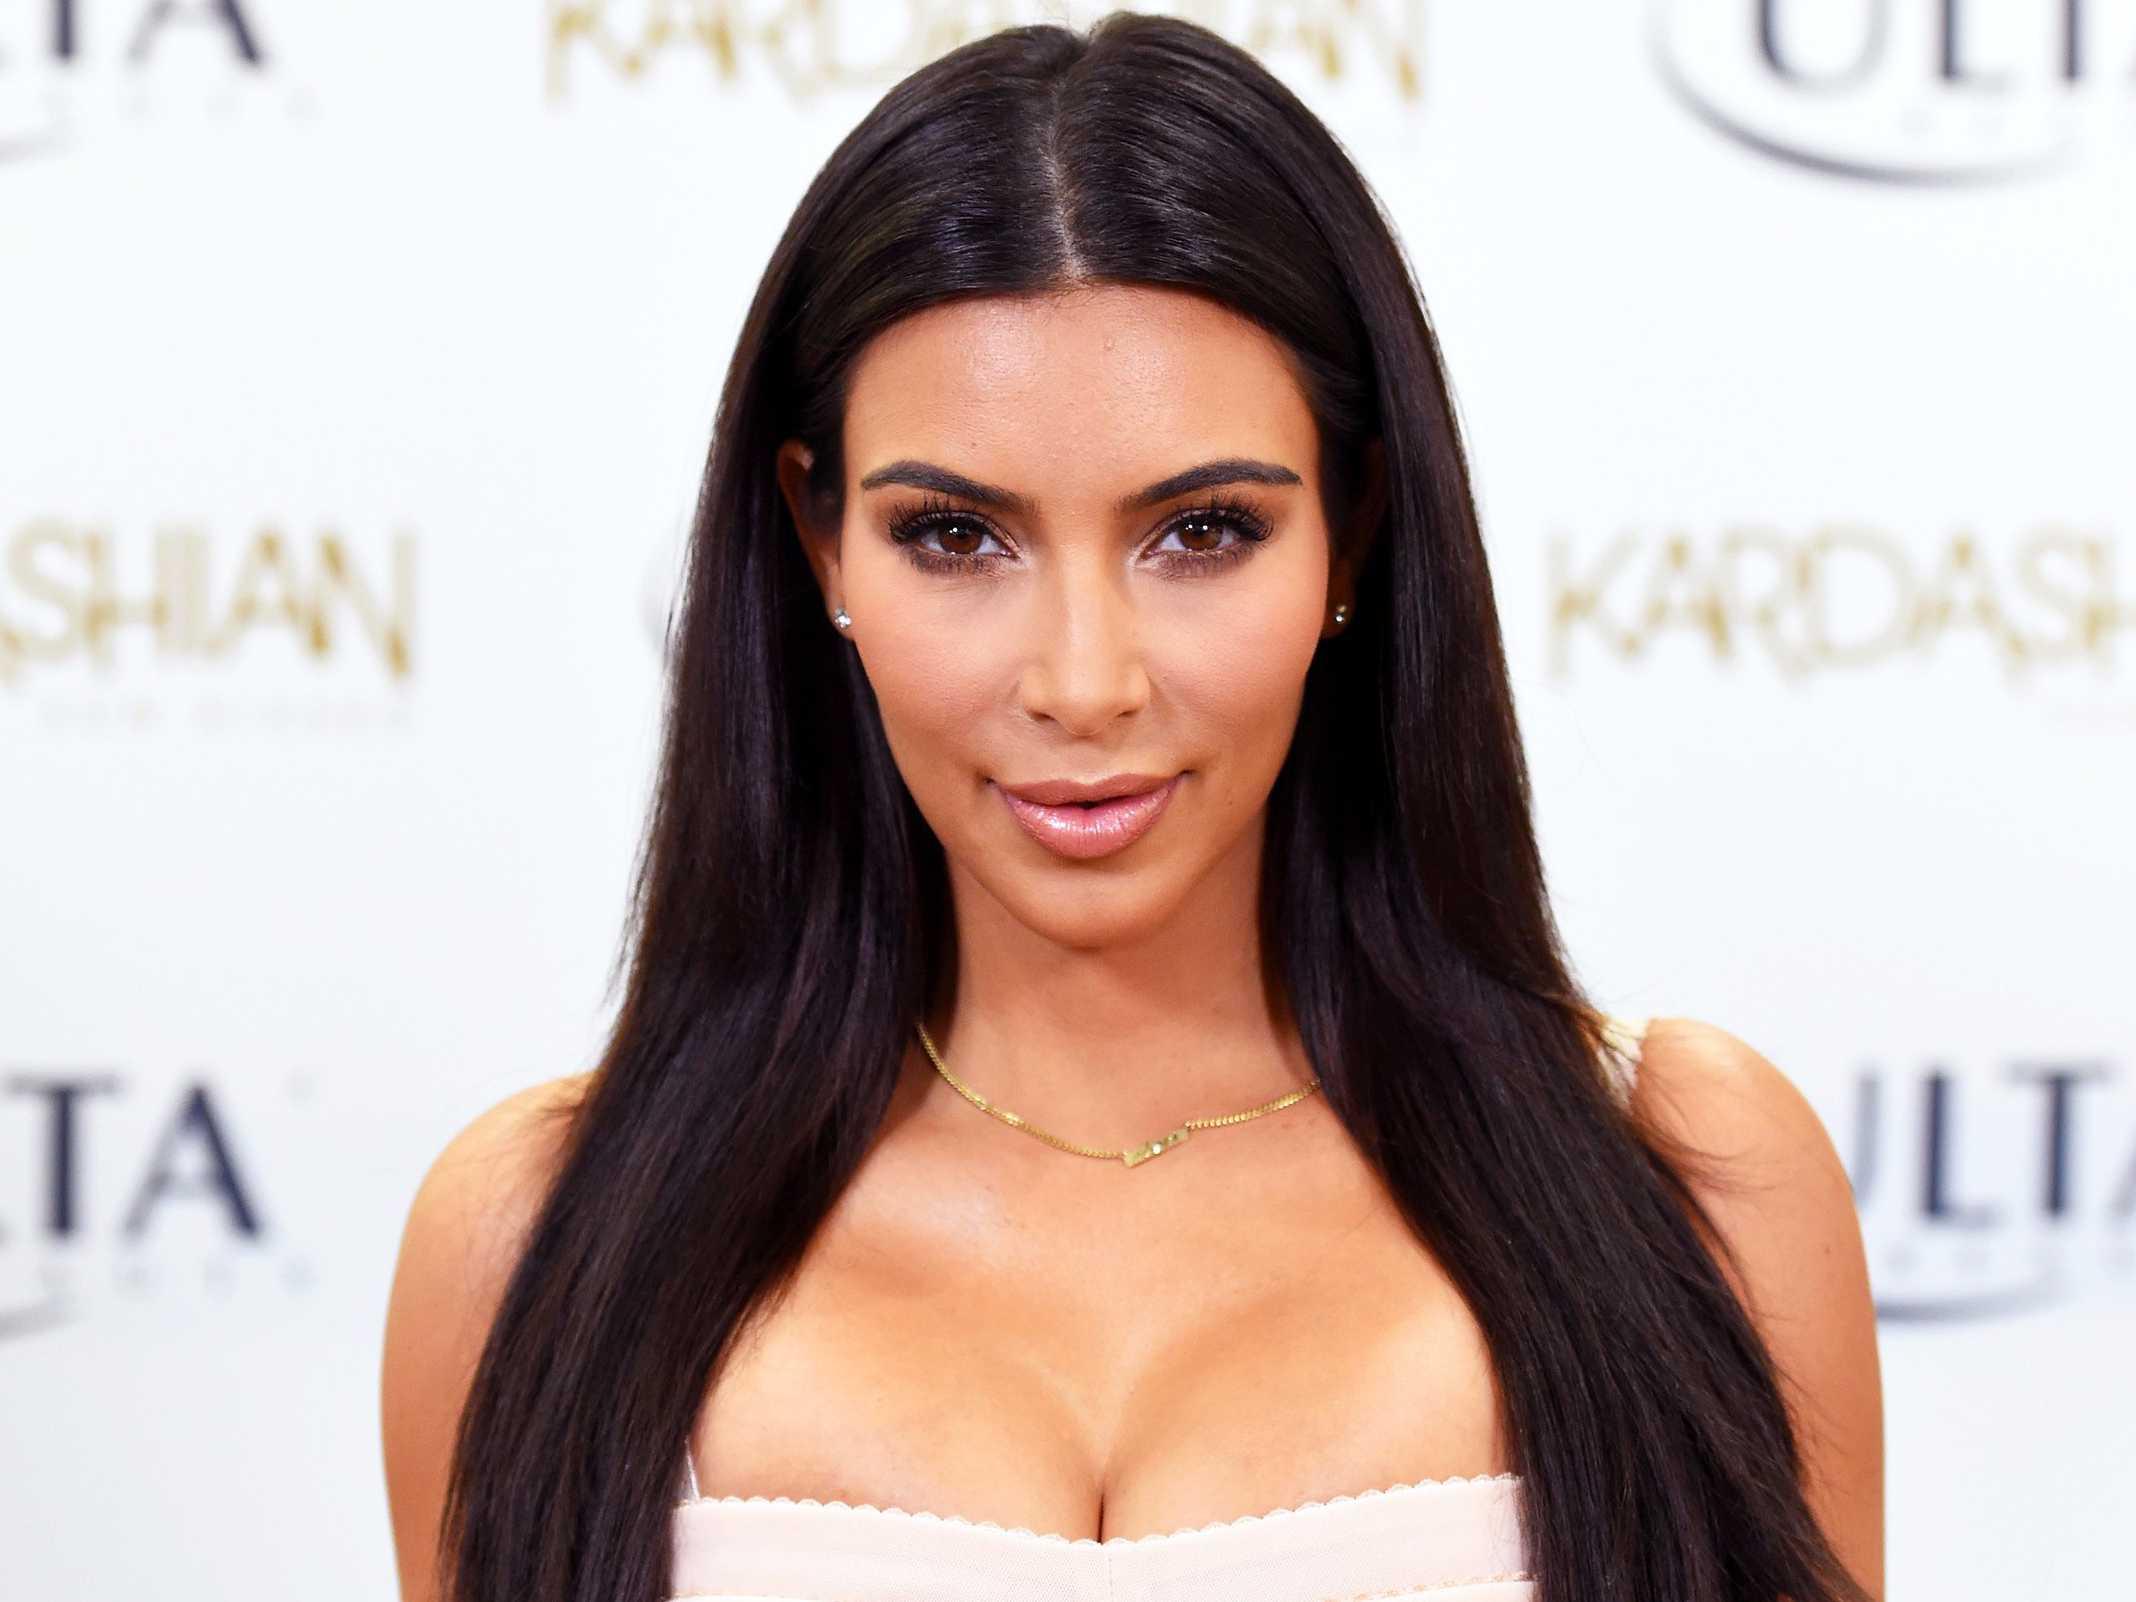 Reactions As Kim Kardashian Shows Off Luxury Kitchen (Video)